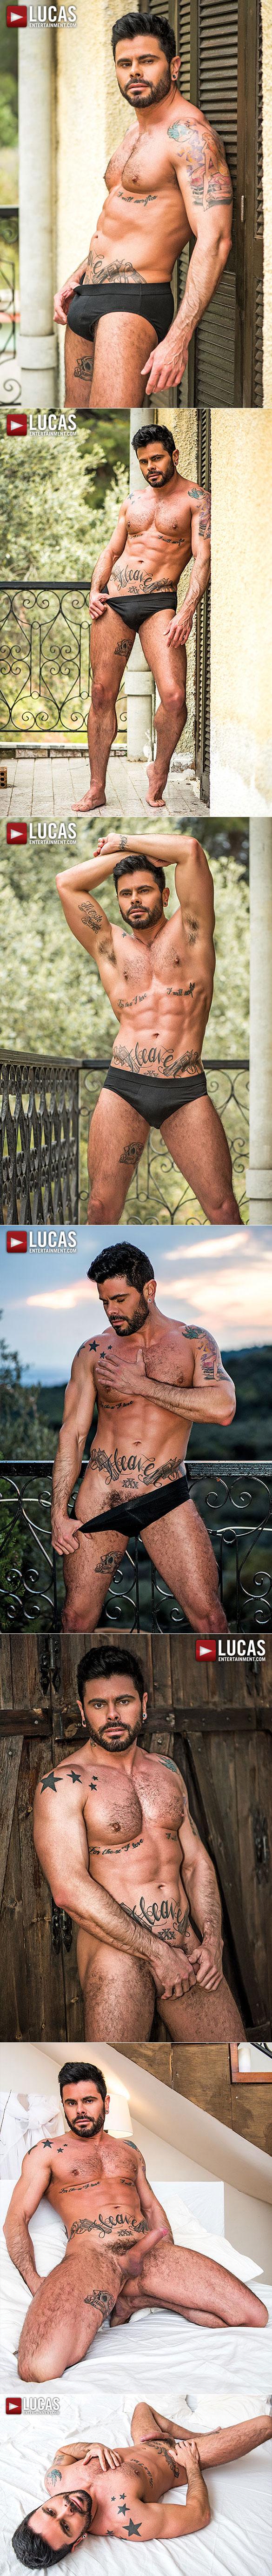 "Lucas Entertainment: James Castle, Adam Killian and Mario Domenech bareback threeway in ""Greece My Hole Raw"""